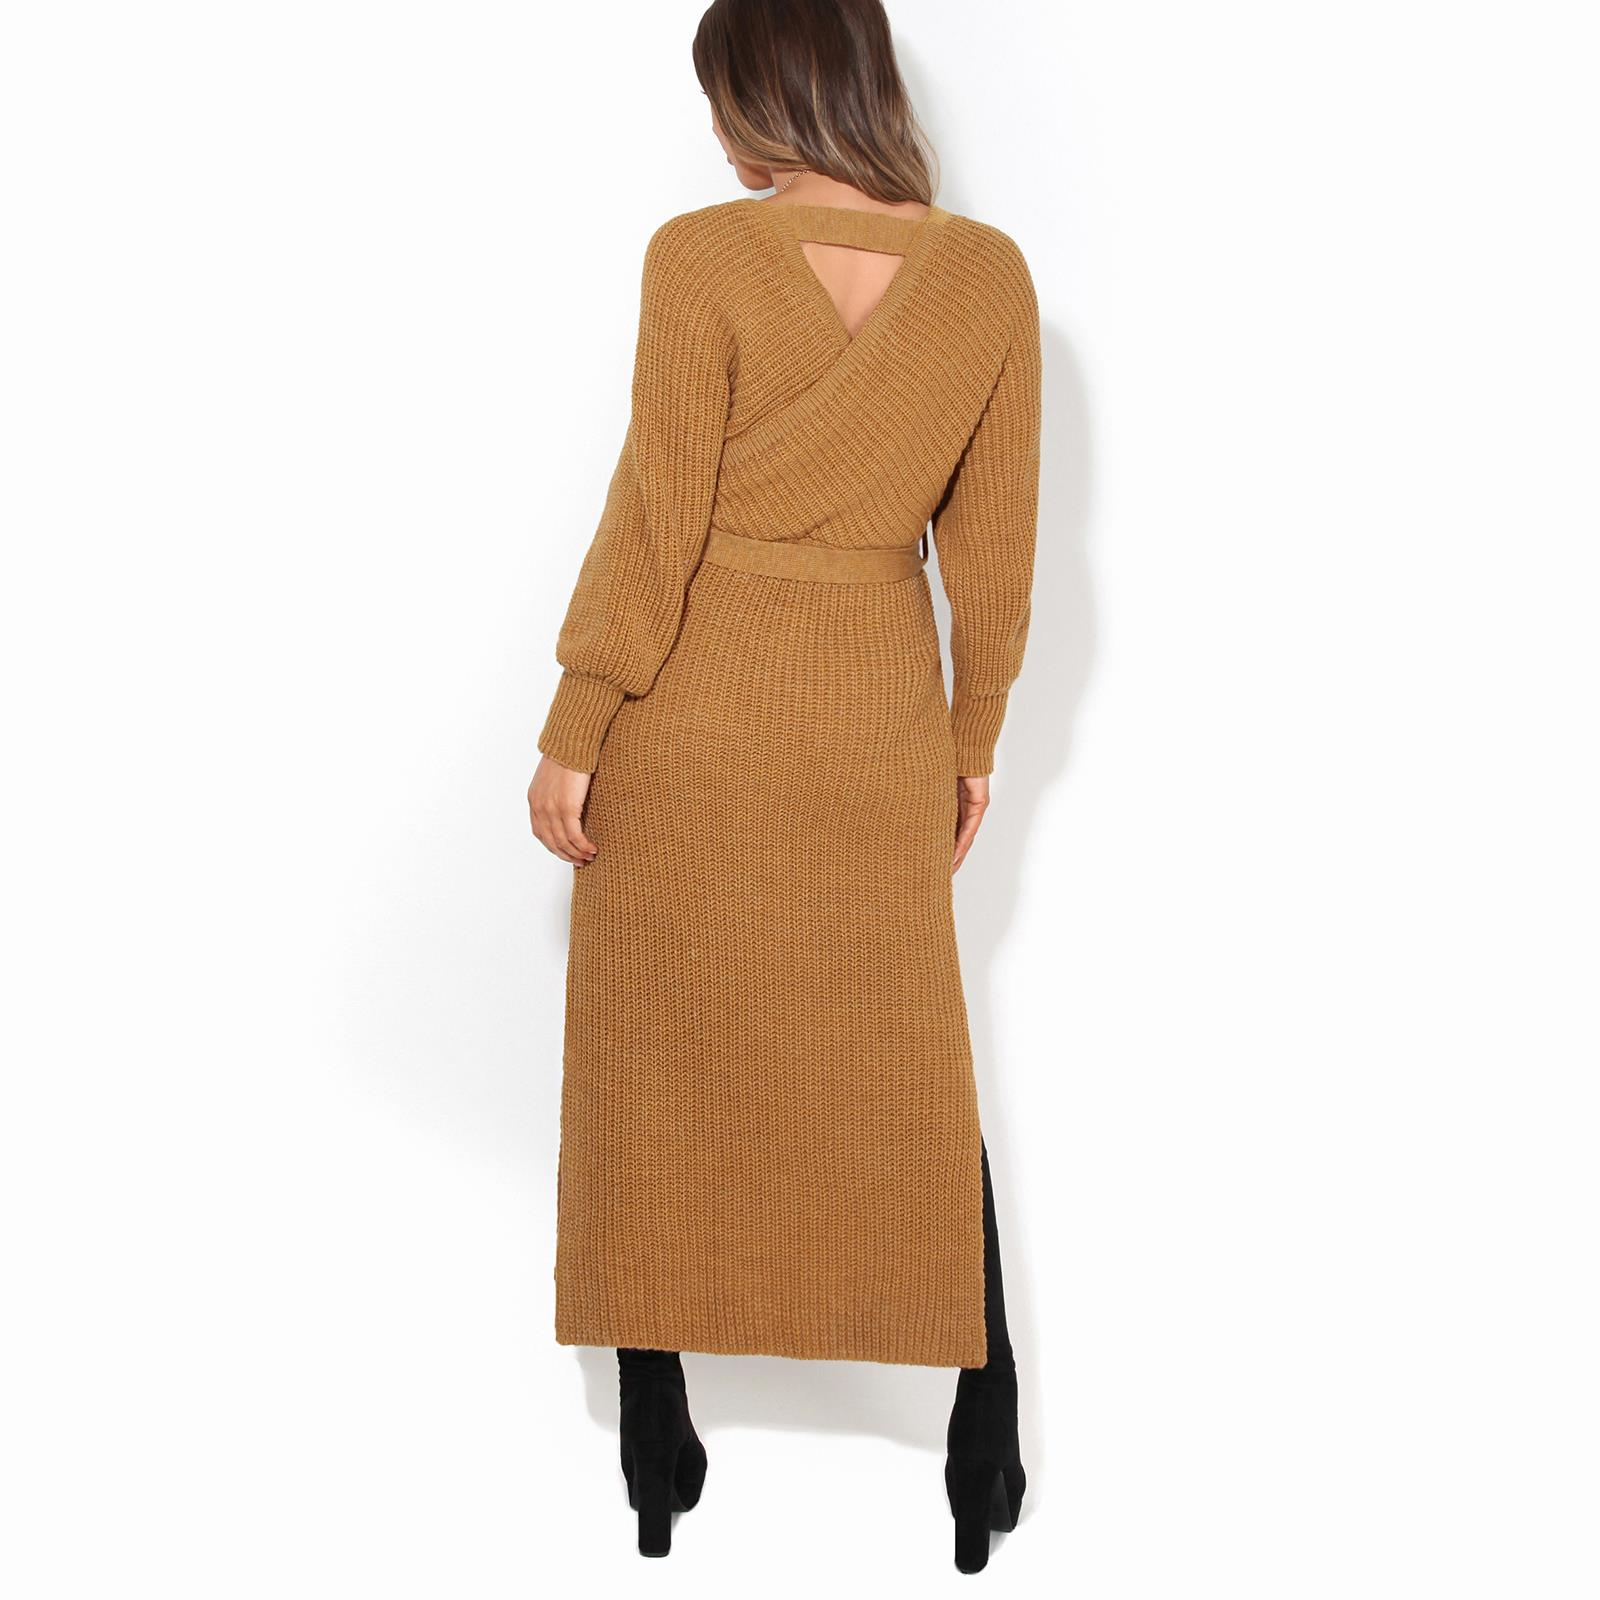 Womens-Ladies-Jumper-Dress-Chunky-Knit-Wrap-V-Neck-Maxi-Long-Sleeve-Winter-Top thumbnail 10